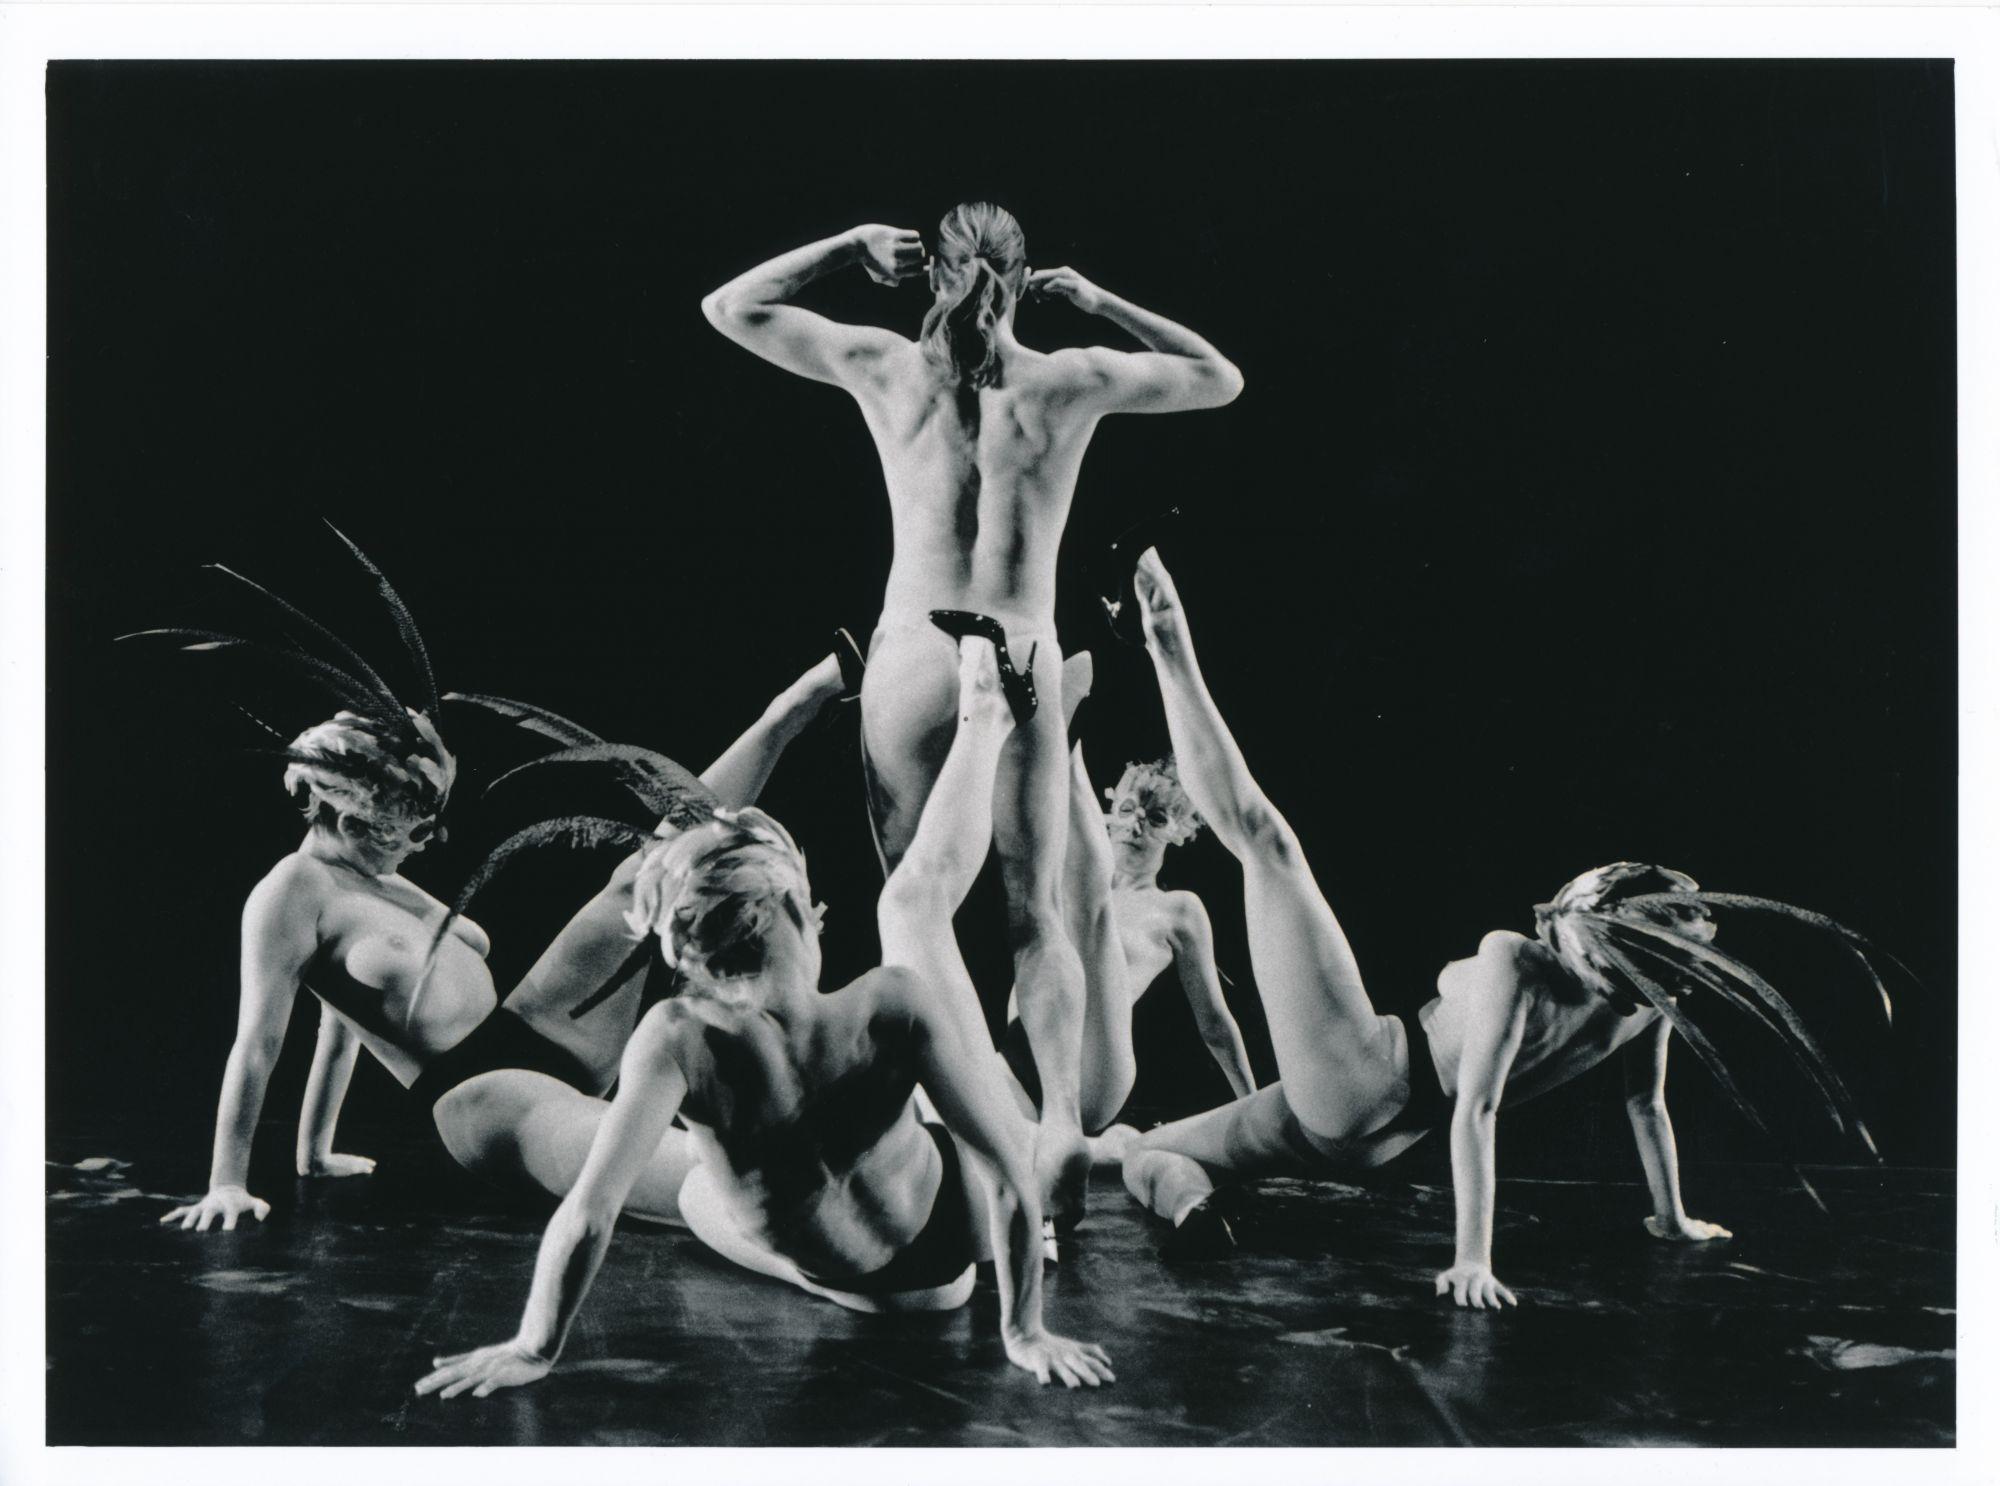 Helsingin kaupunginteatterin tanssiryhmä, Keppi, chor. Anzu Furukawa, 1996